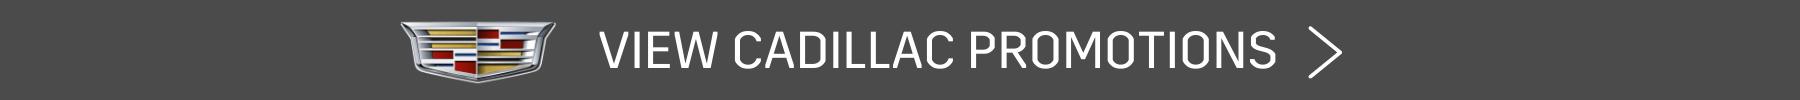 Access Cadillac Site